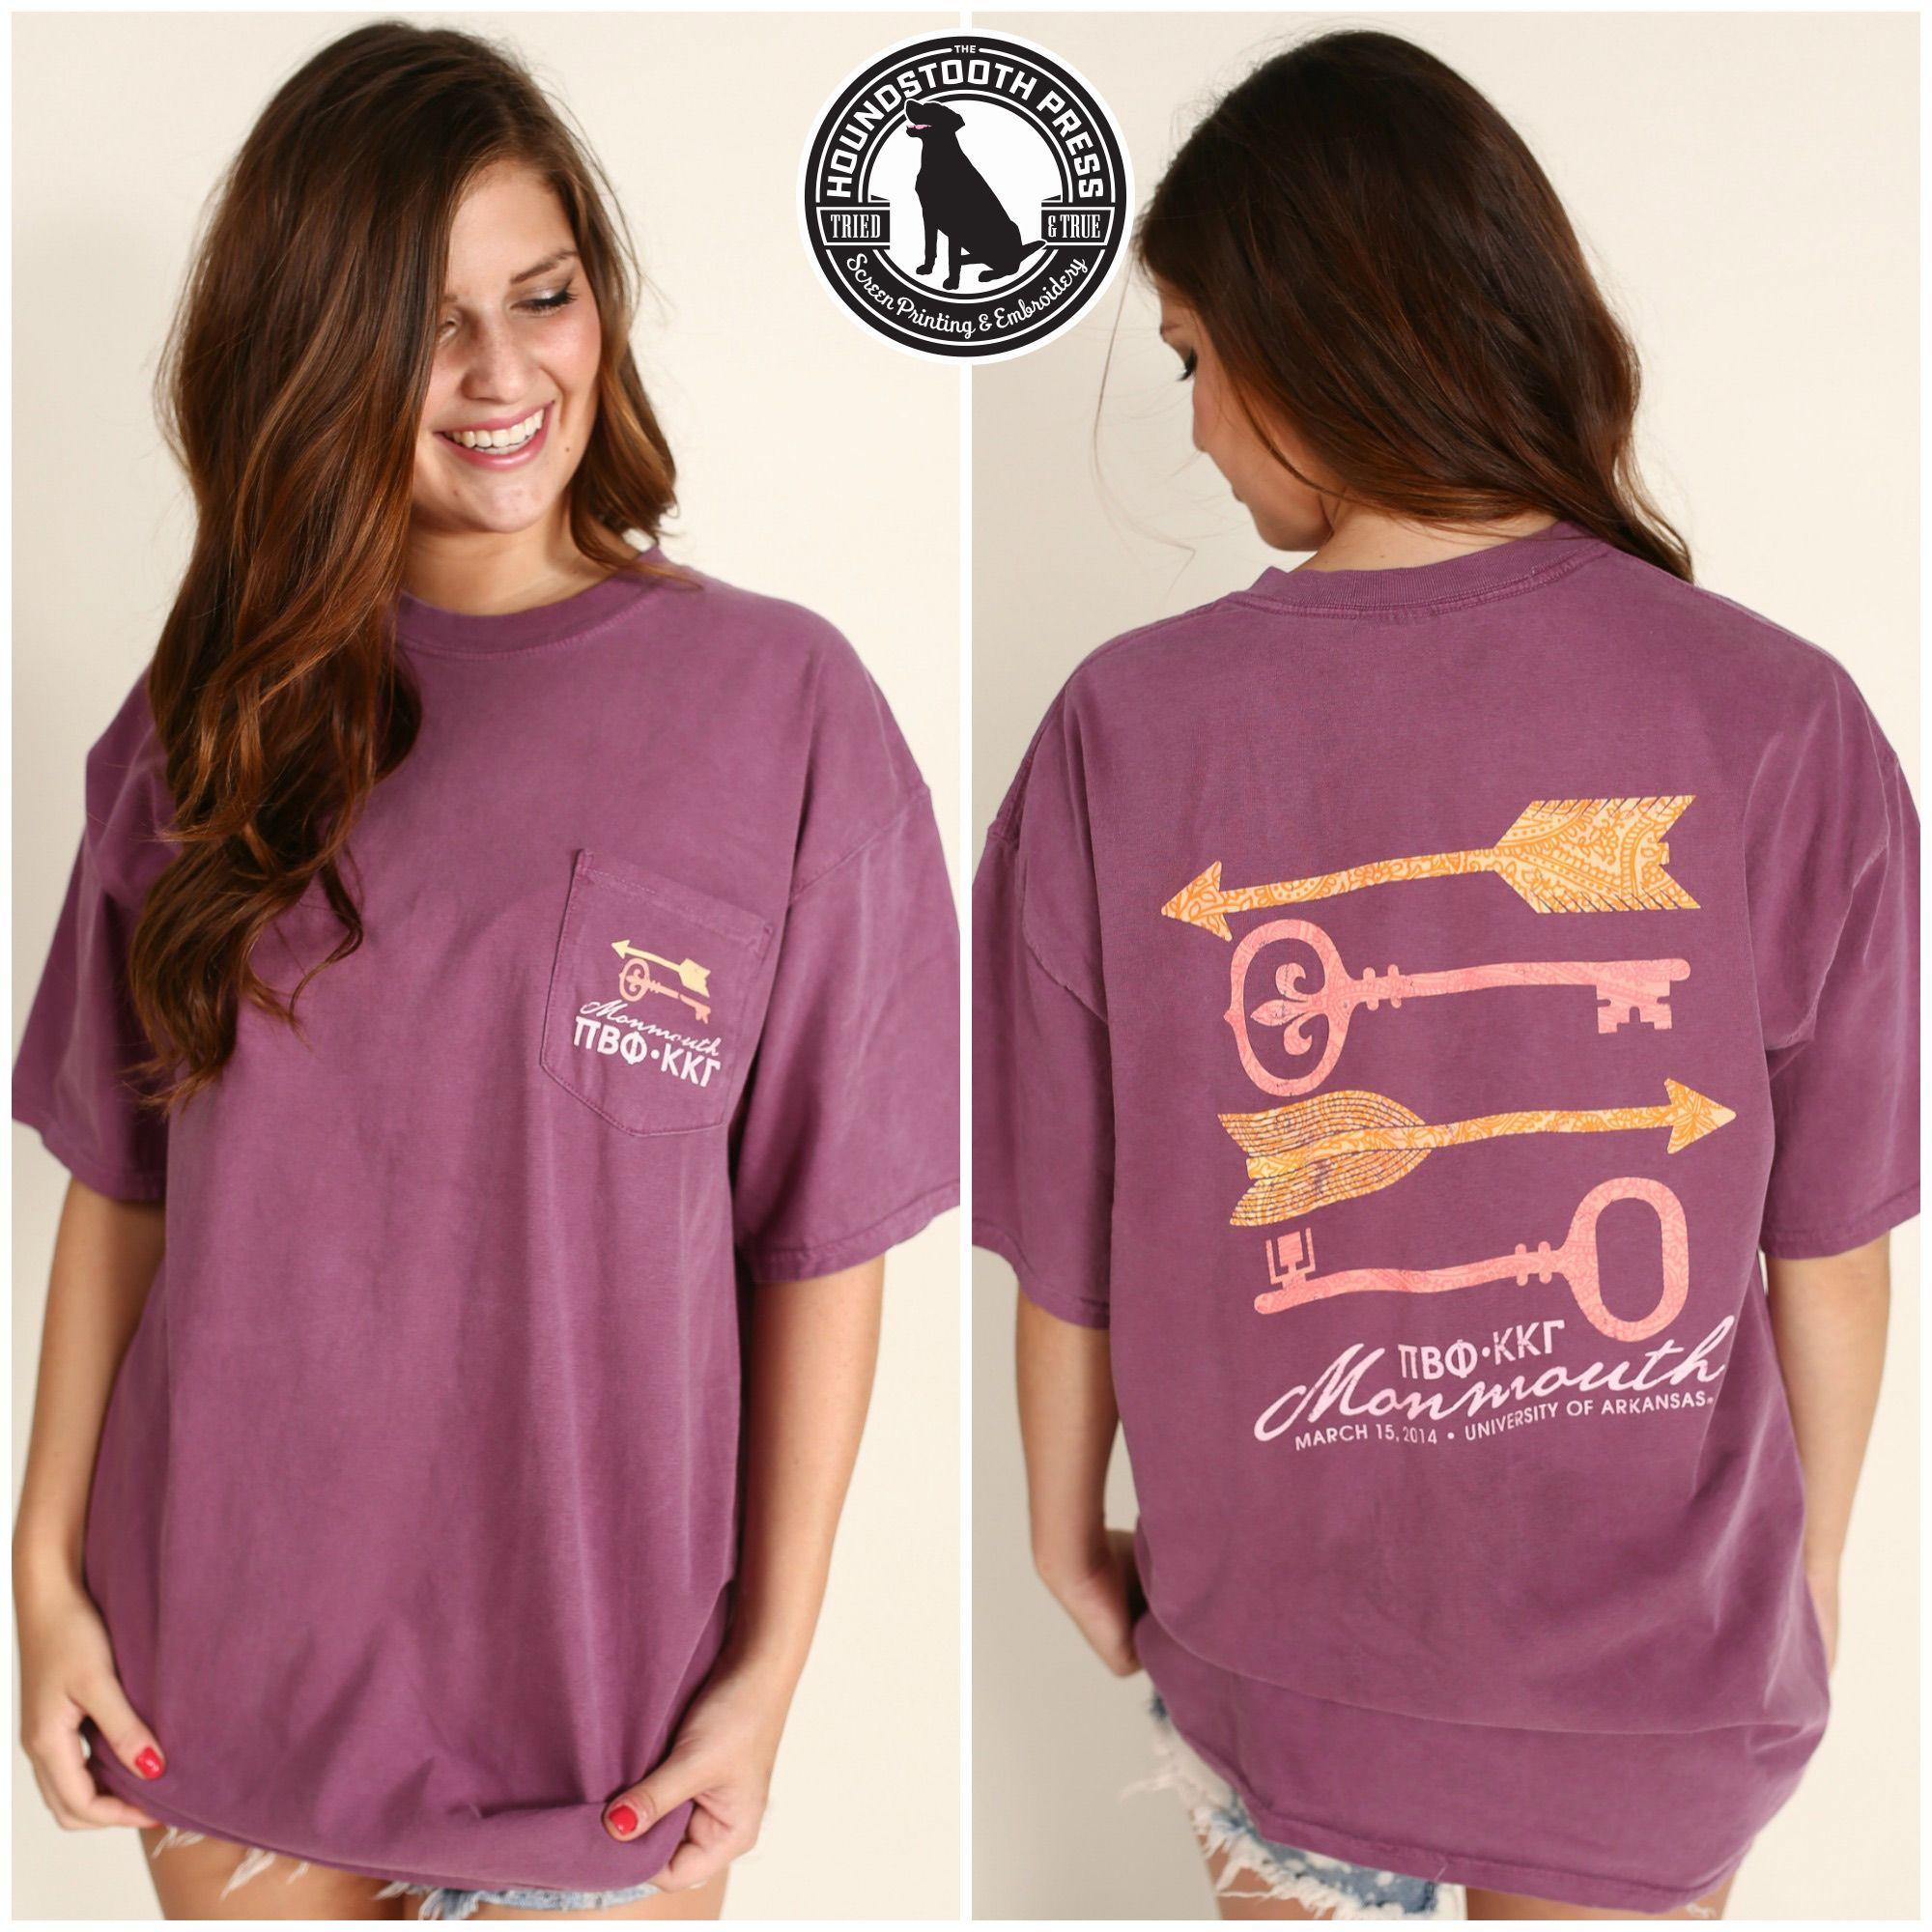 Design t shirt comfort colors - University Of Arkansas Pi Beta Phi Monmouth Formal T Shirt Comfort Colors